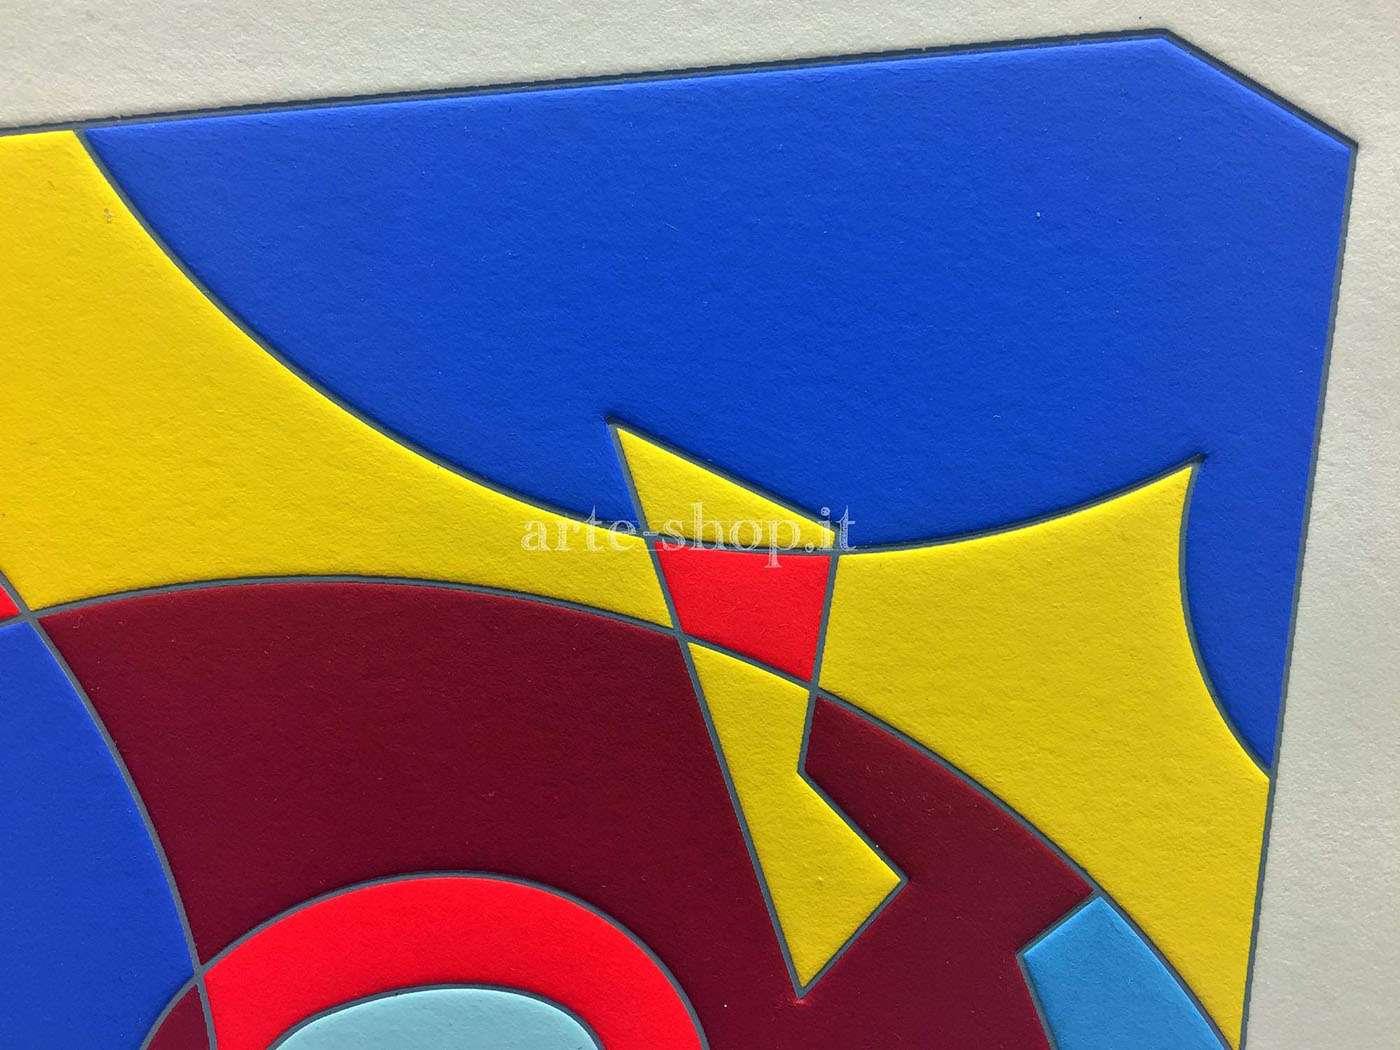 arte pentagono shop dettaglio numero 197